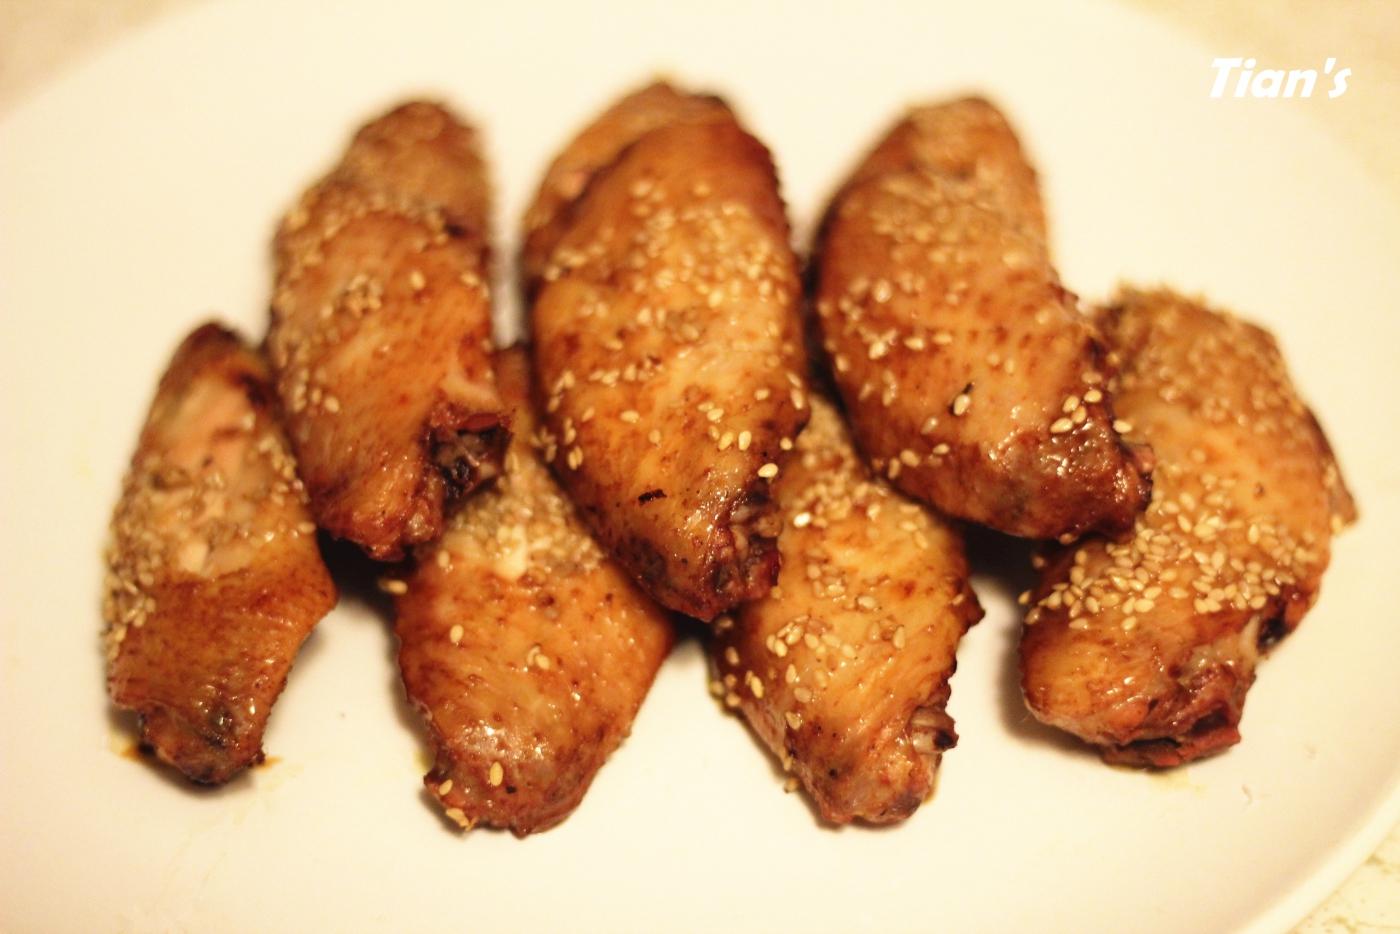 [8 STUDIO]秘制烤鸡翅_图1-7